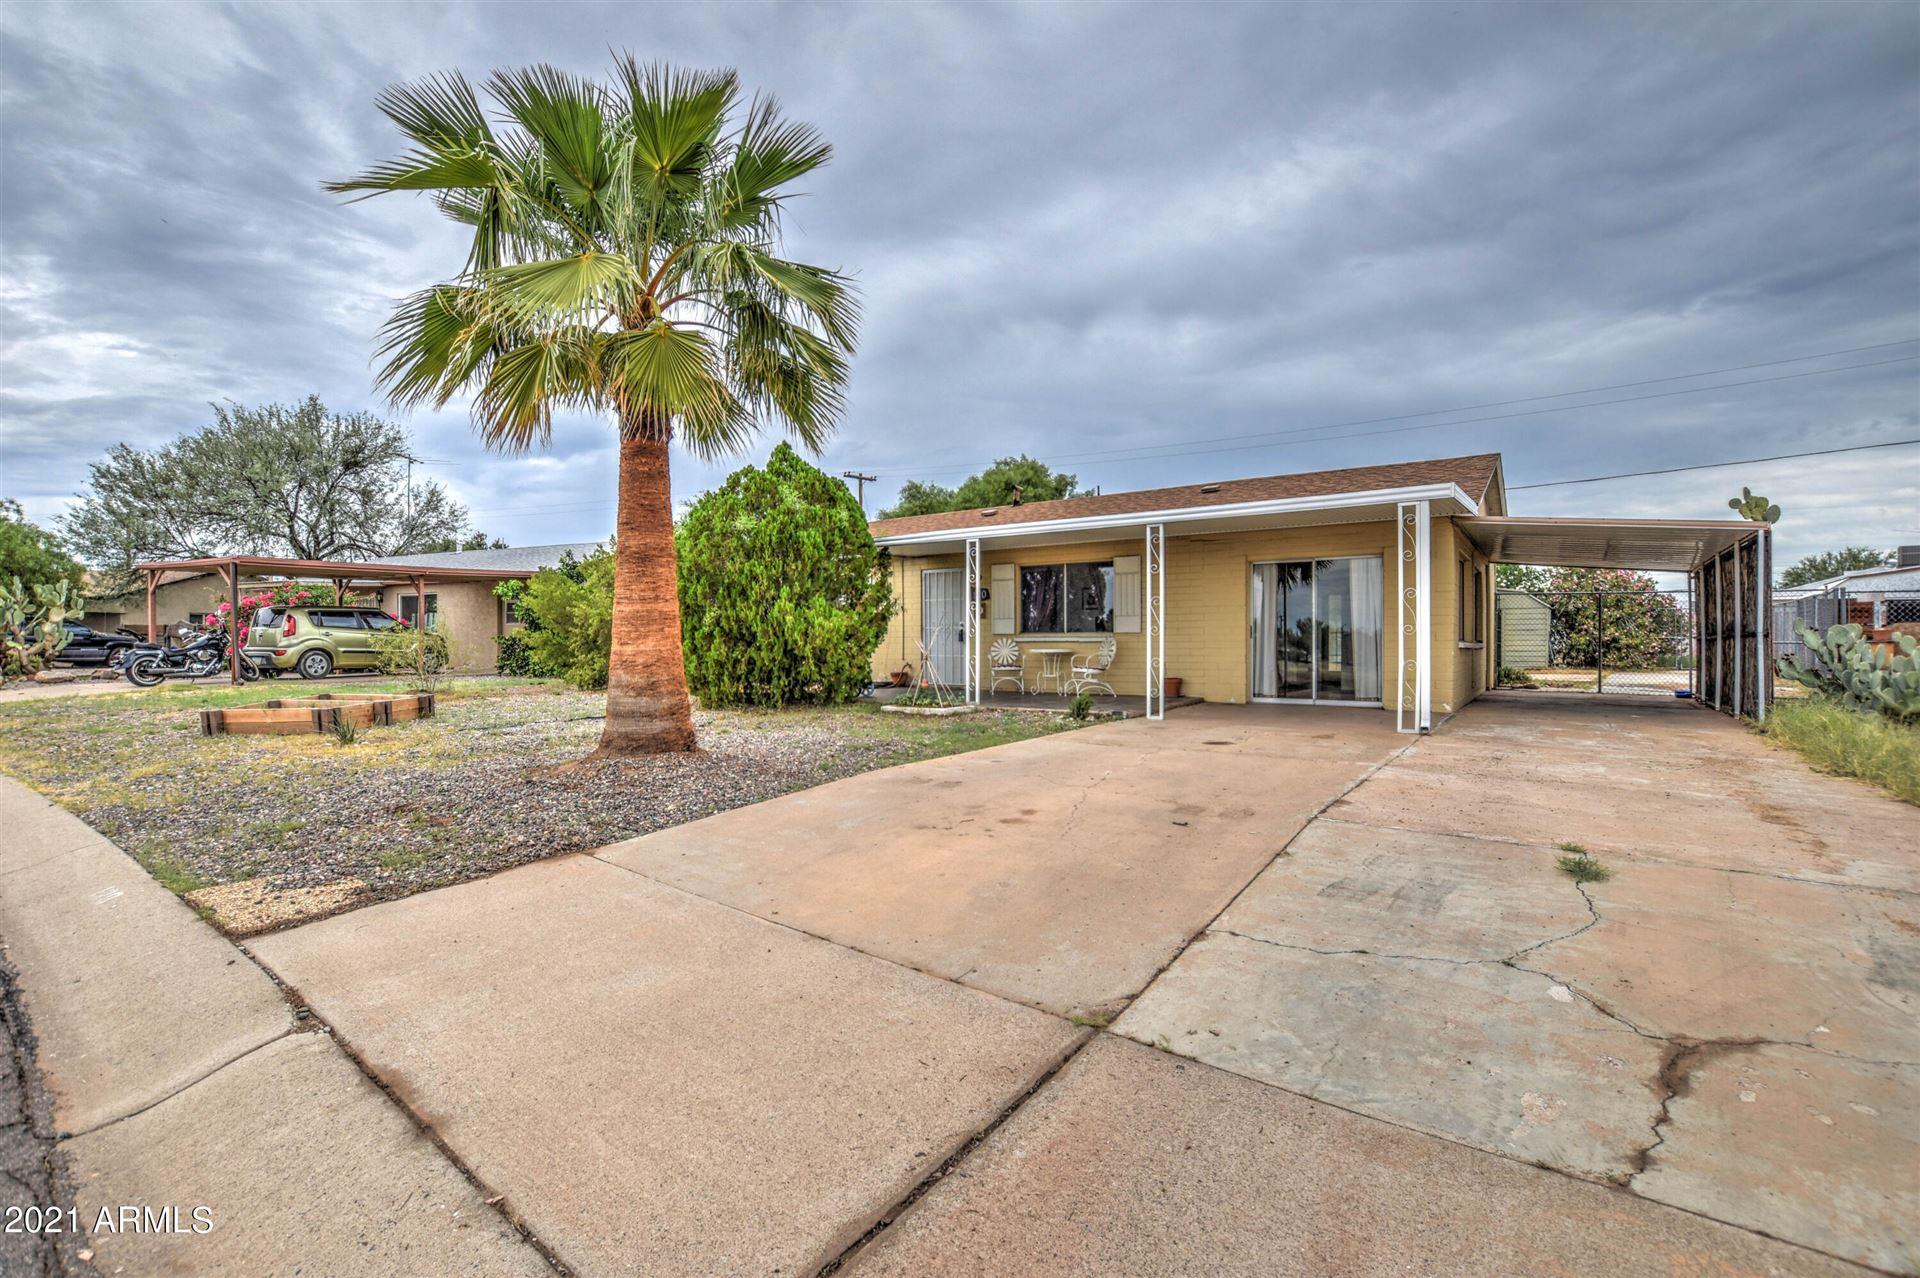 Photo of 120 Debs Circle, Morristown, AZ 85342 (MLS # 6287714)